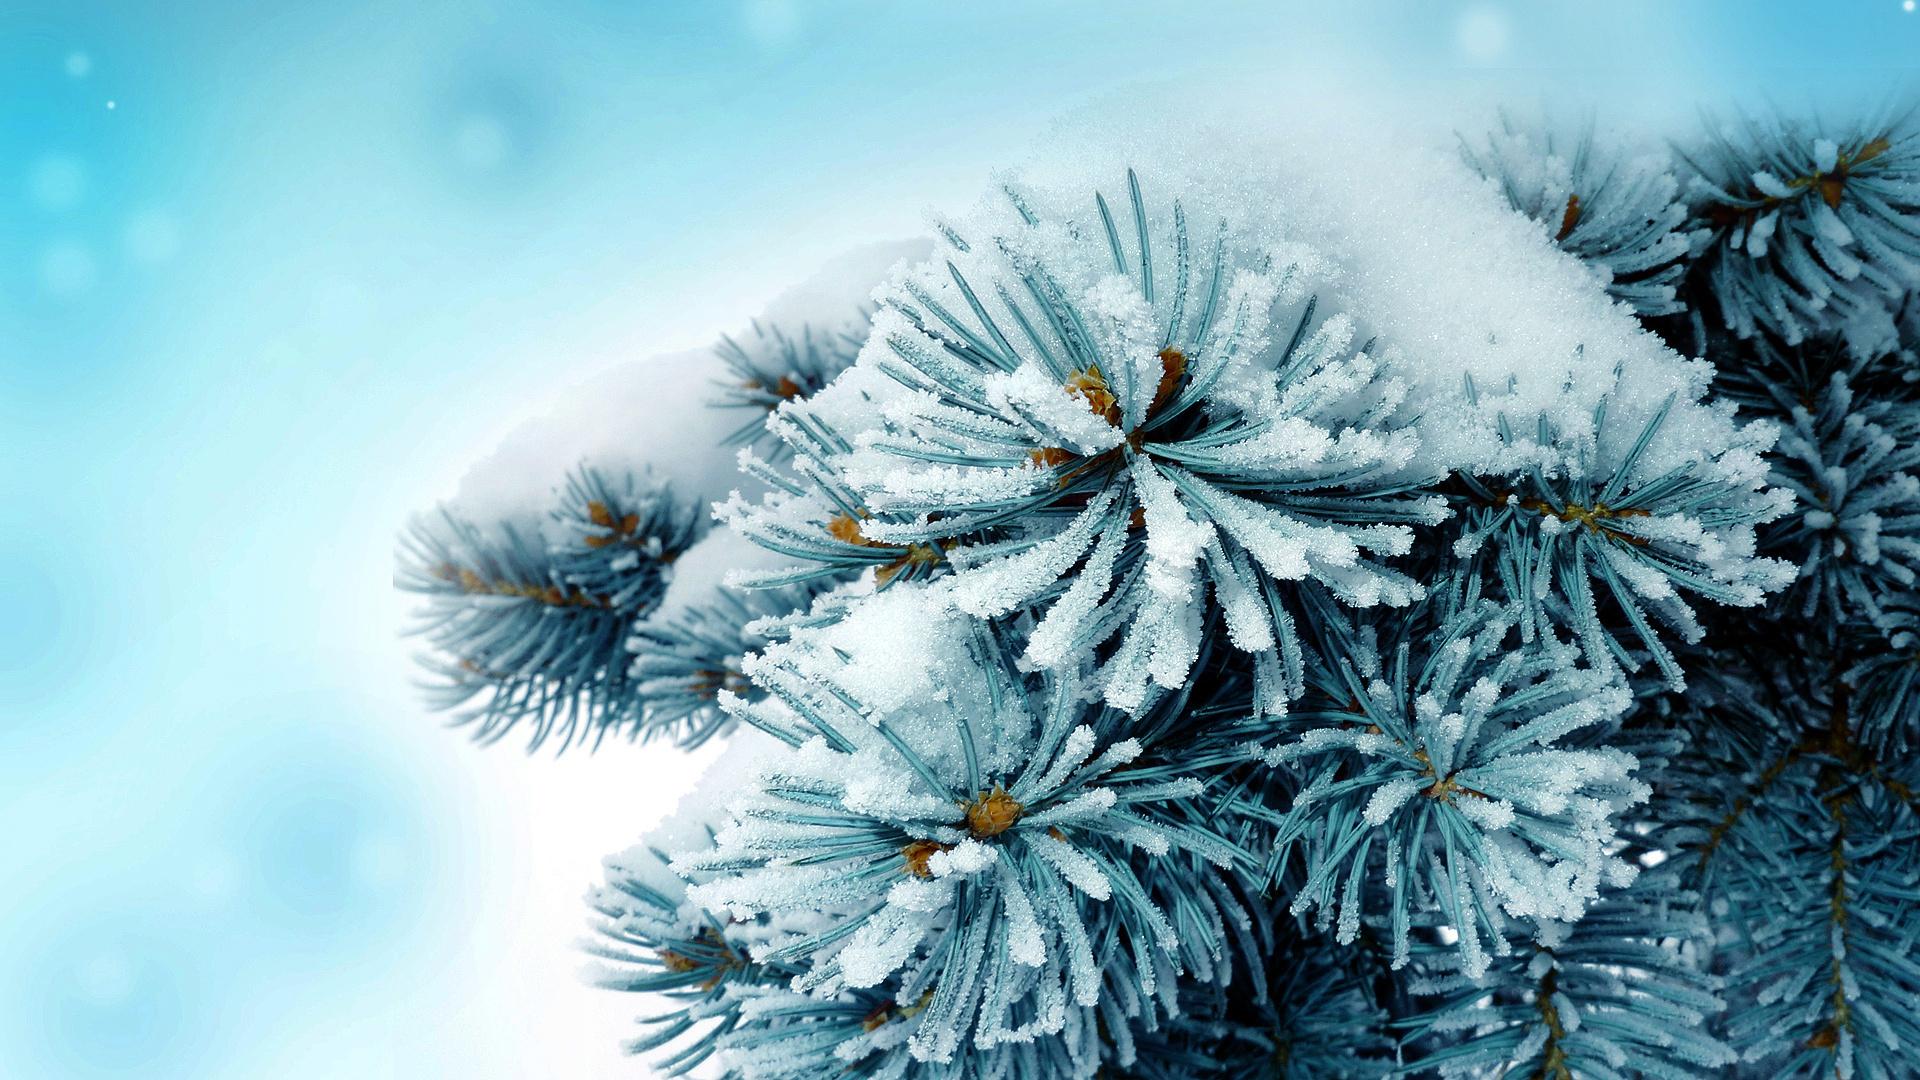 Pine tree full hd wallpaper and background image for Sfondi invernali hd